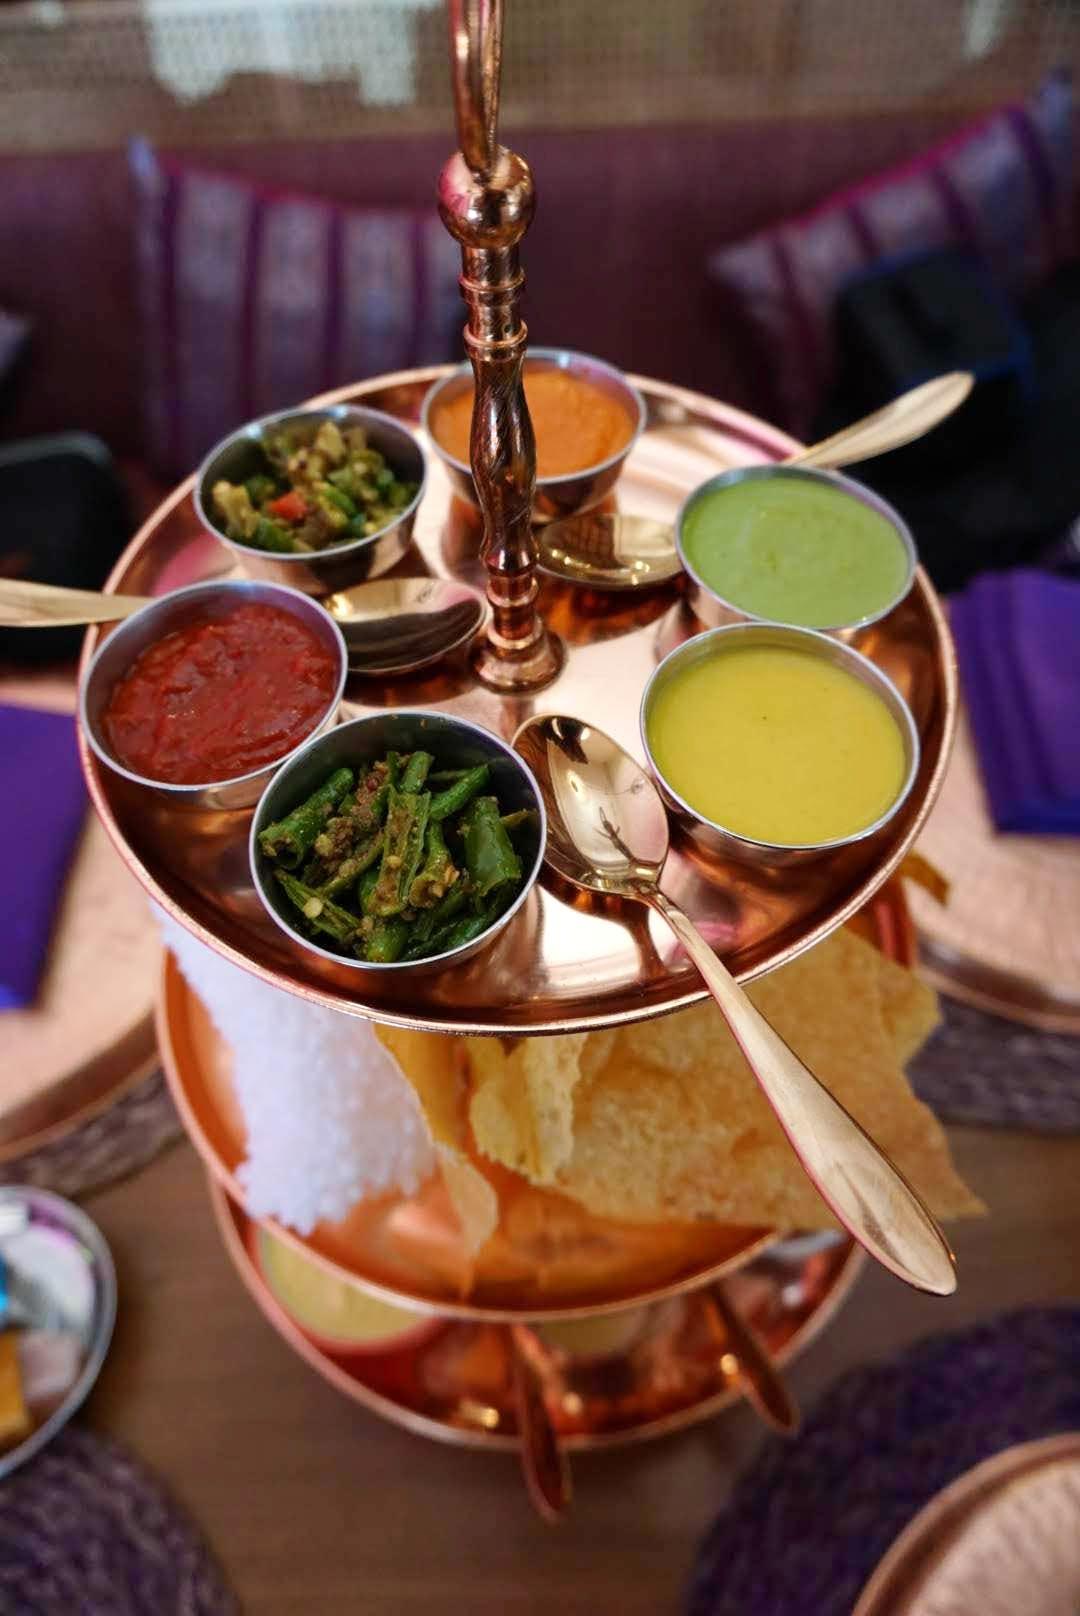 Food,Meal,Dish,Cuisine,Brunch,Ingredient,Comfort food,Lunch,Indian cuisine,Recipe